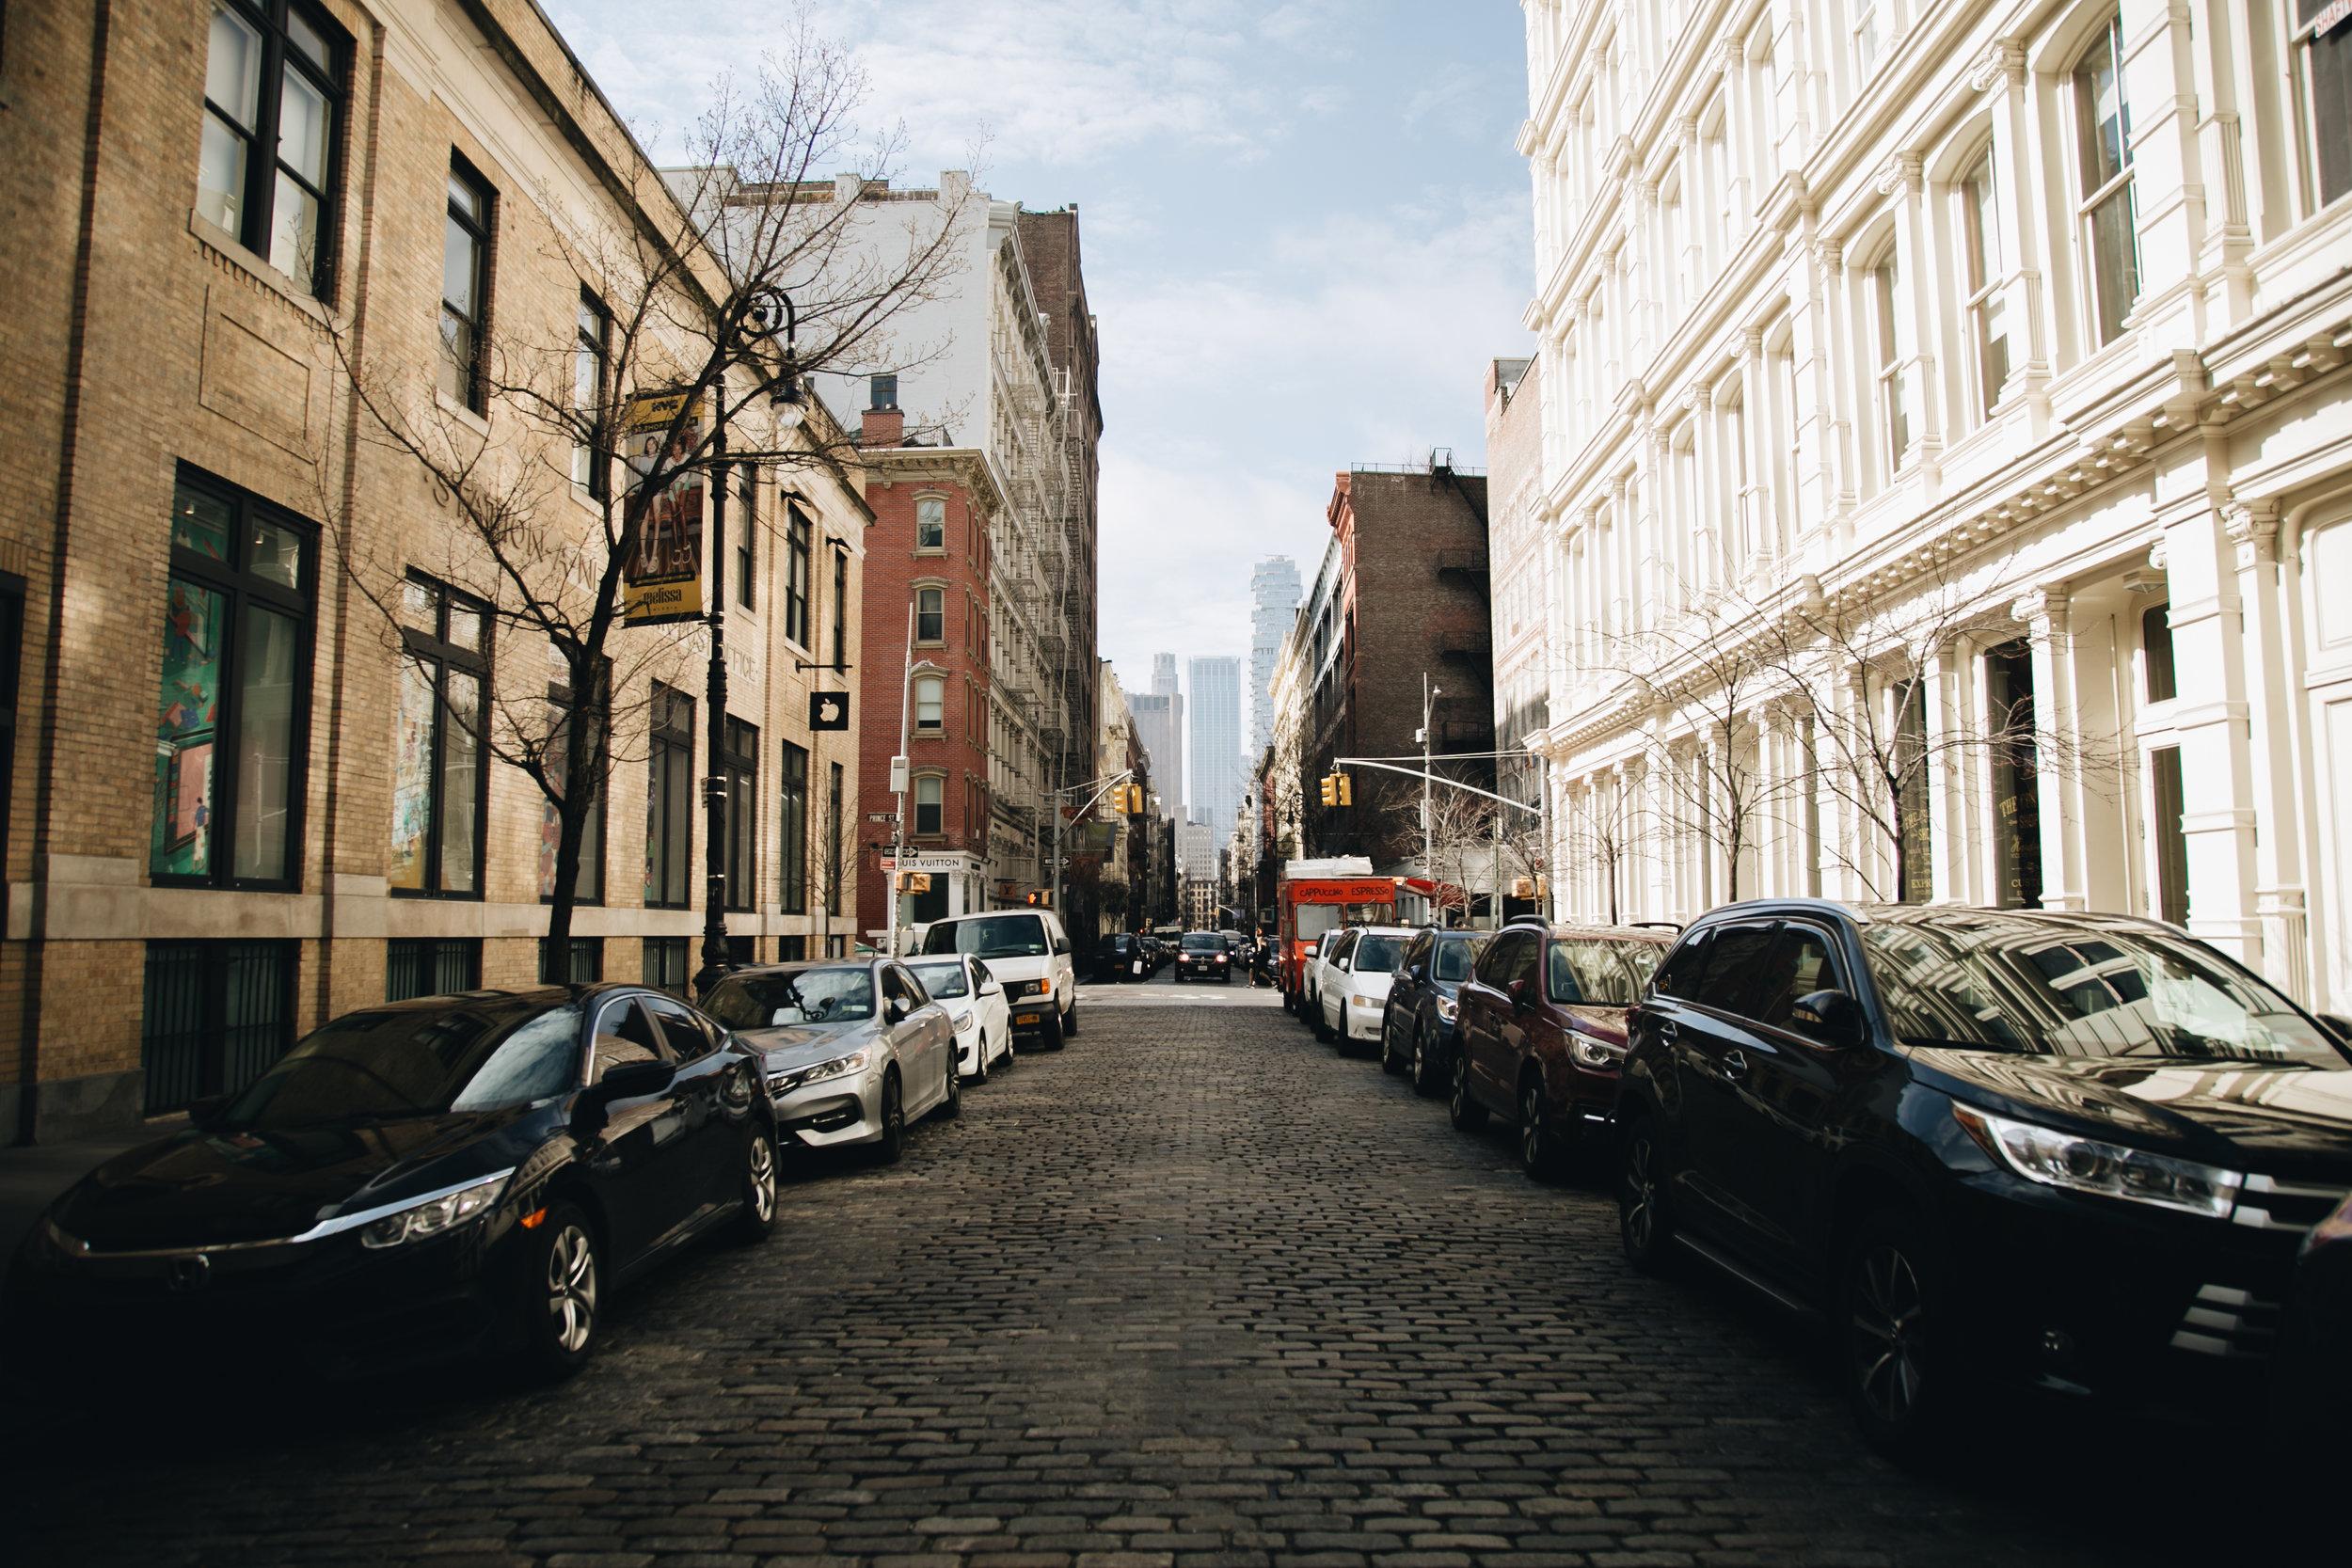 SoHo-voyage-à-new-york-onmyway.jpg